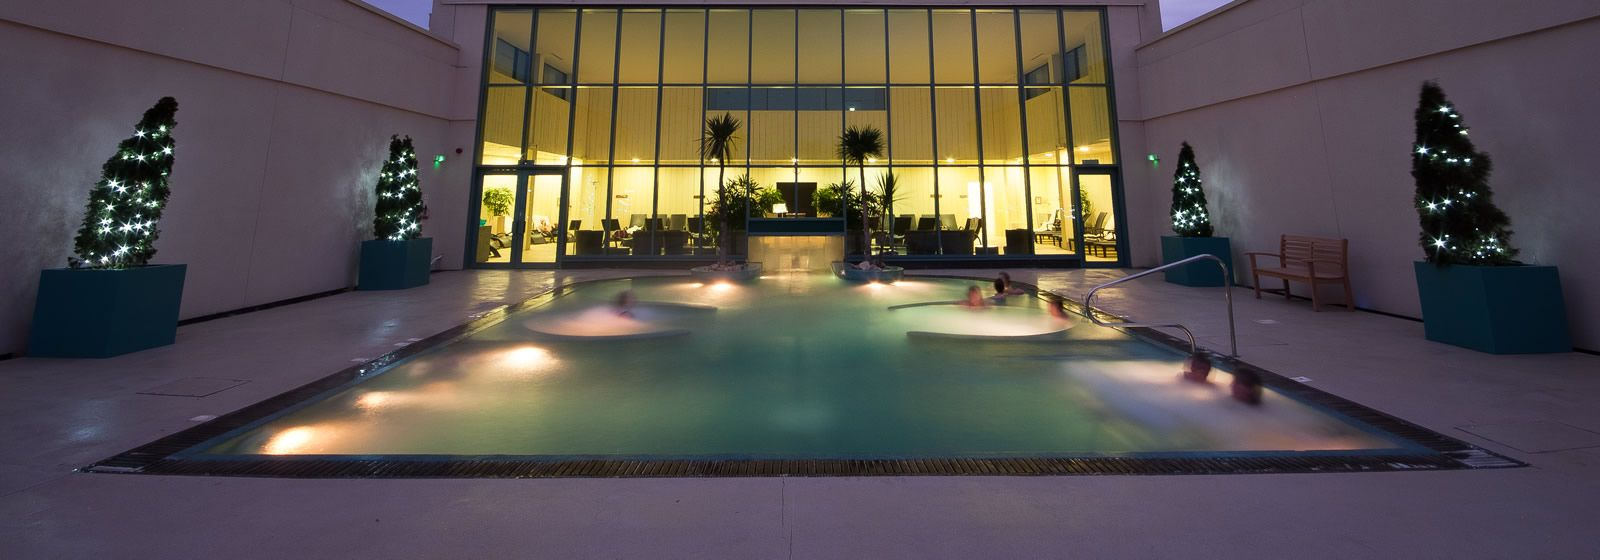 The Malvern Spa Luxury Hotel In Worcestershire